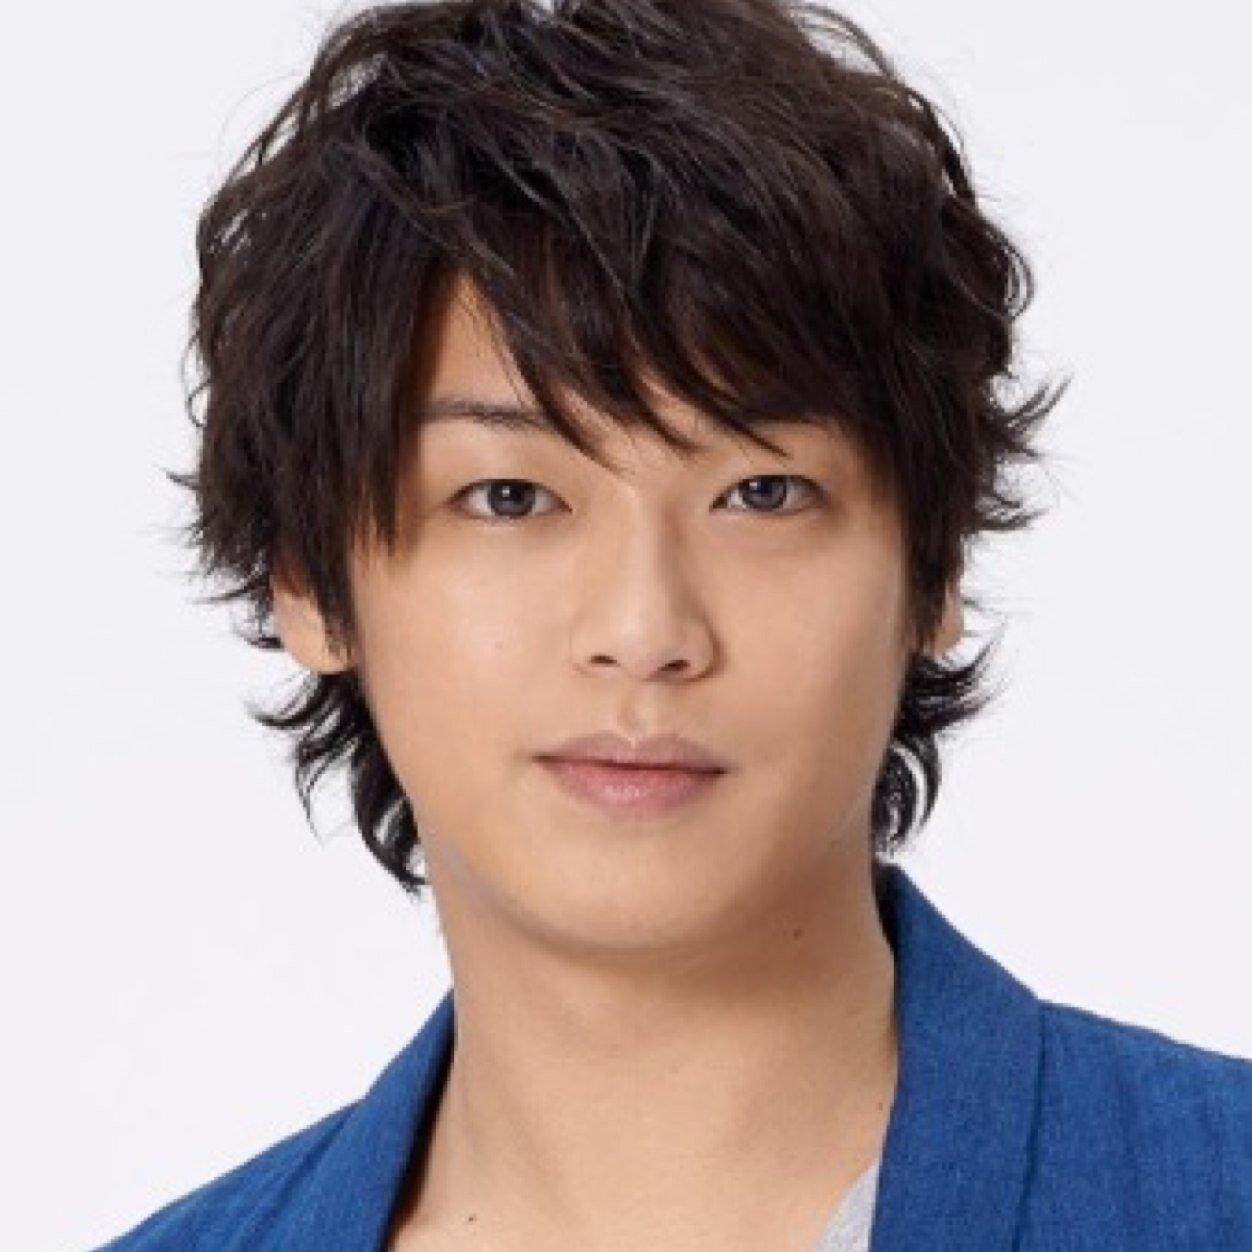 高木雄也 (@takaki_yuya) | Twit...